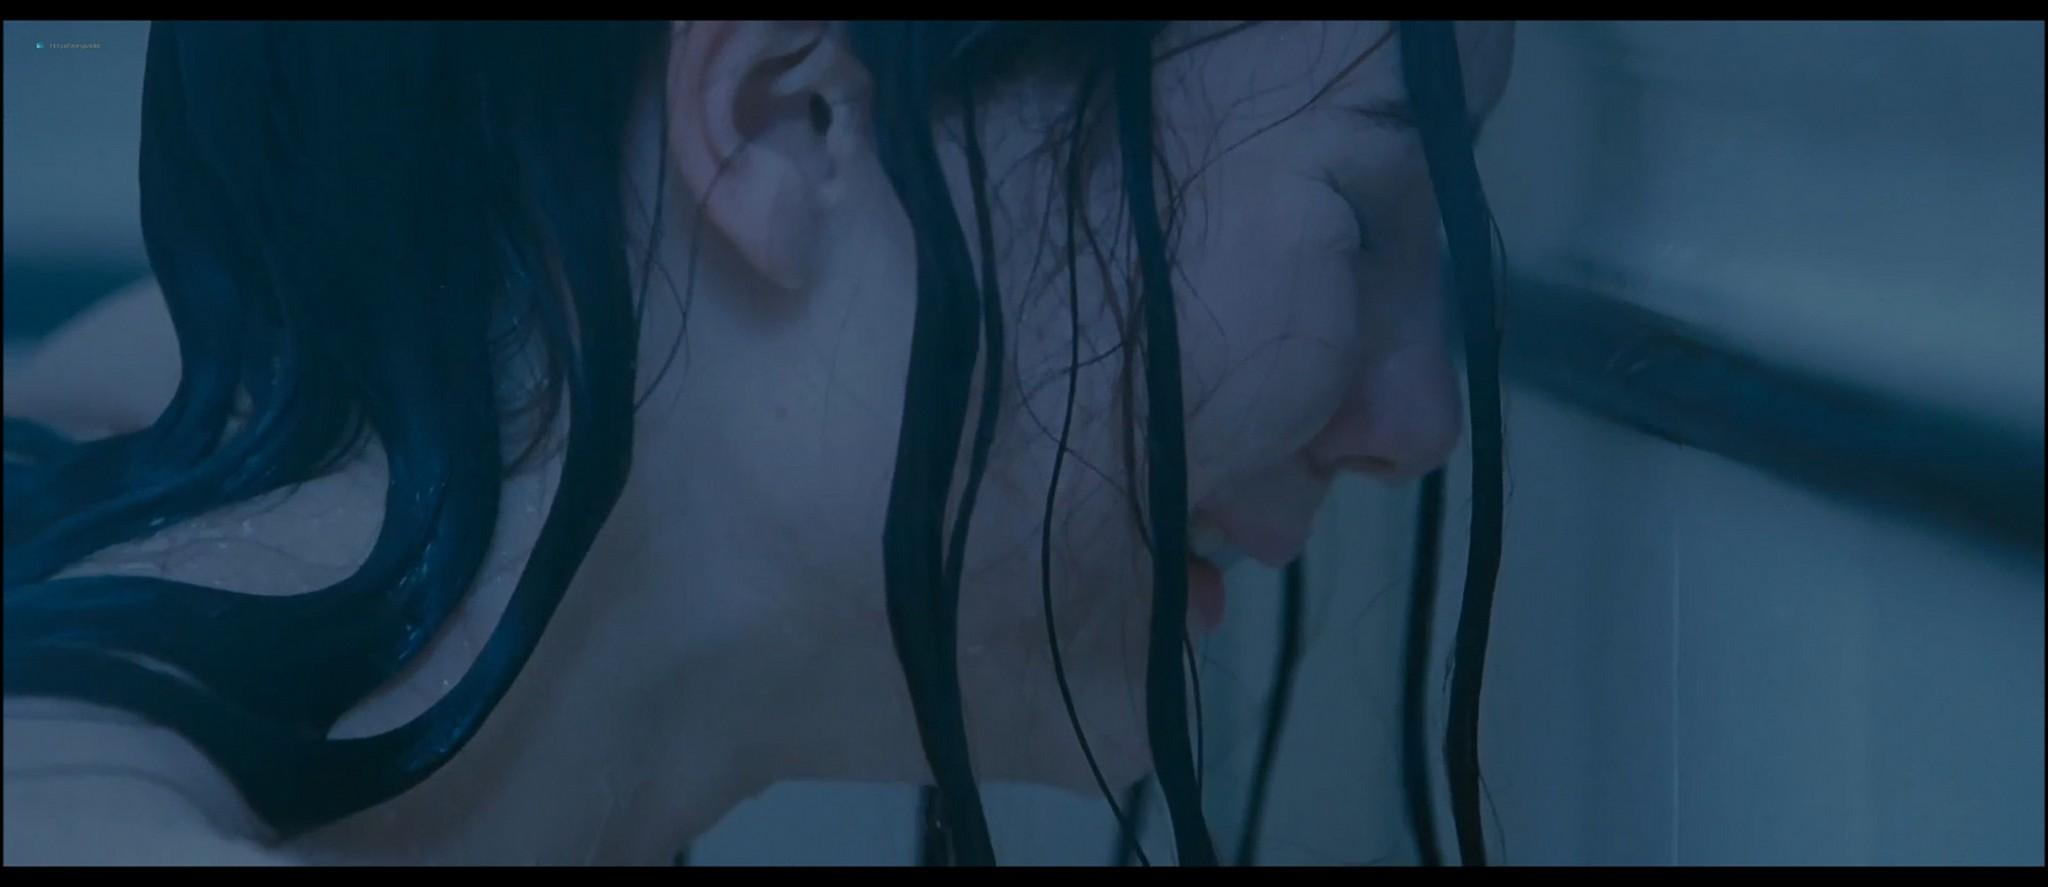 Mia Wasikowska nude nipple peak and butt while masturbating nude in the shower - Stoker (2013) HD 1080p BluRay (7)